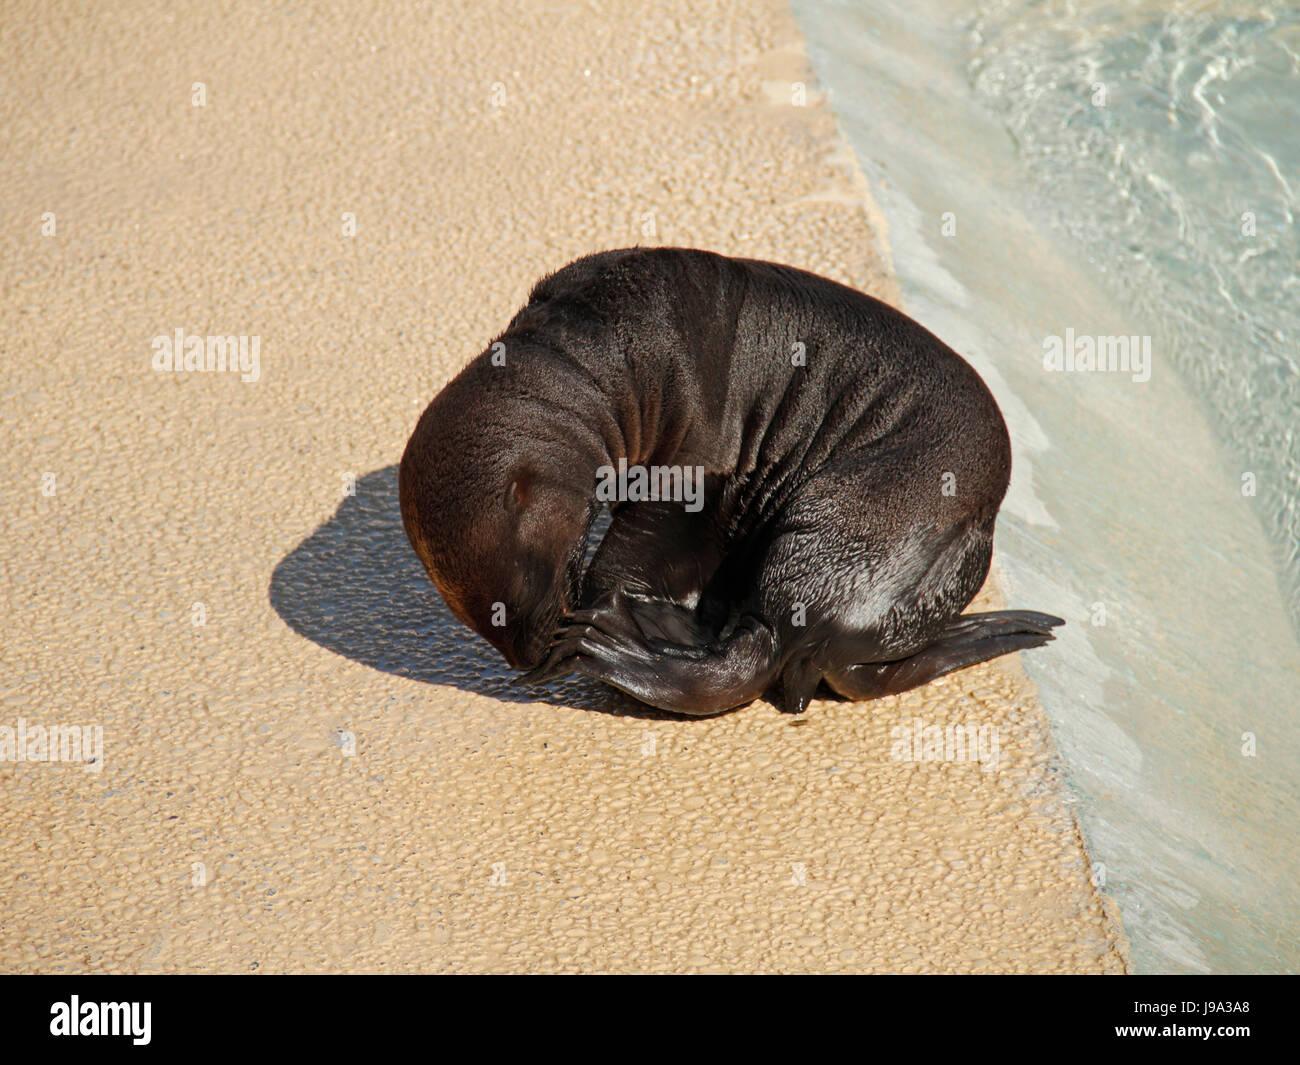 mammals, crawl, sea lion, animal, mammal, brown, brownish, brunette, hunter, Stock Photo